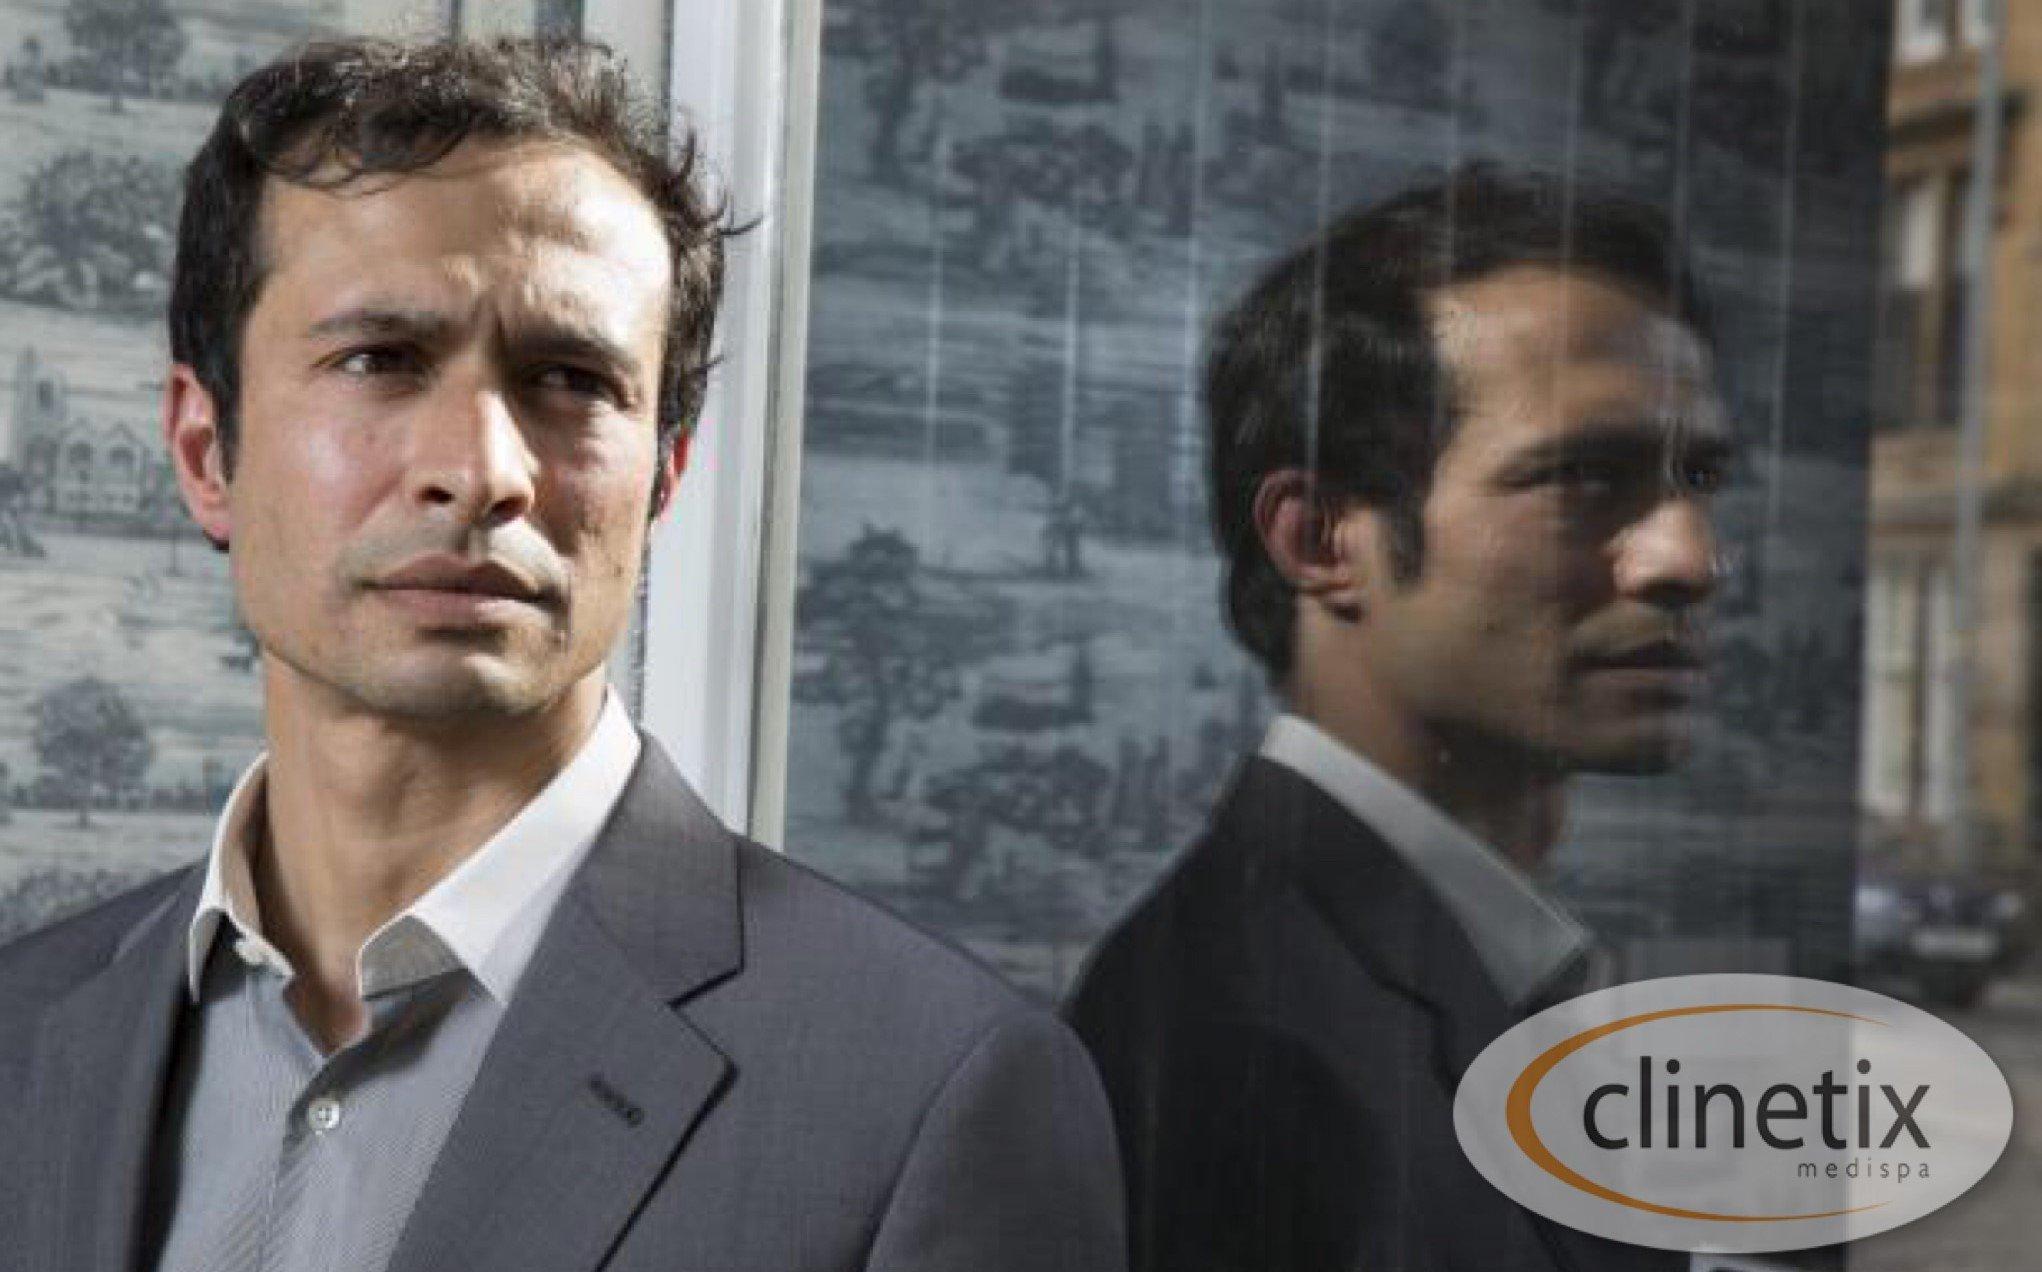 Clinetix Director Dr Simon Ravichandran